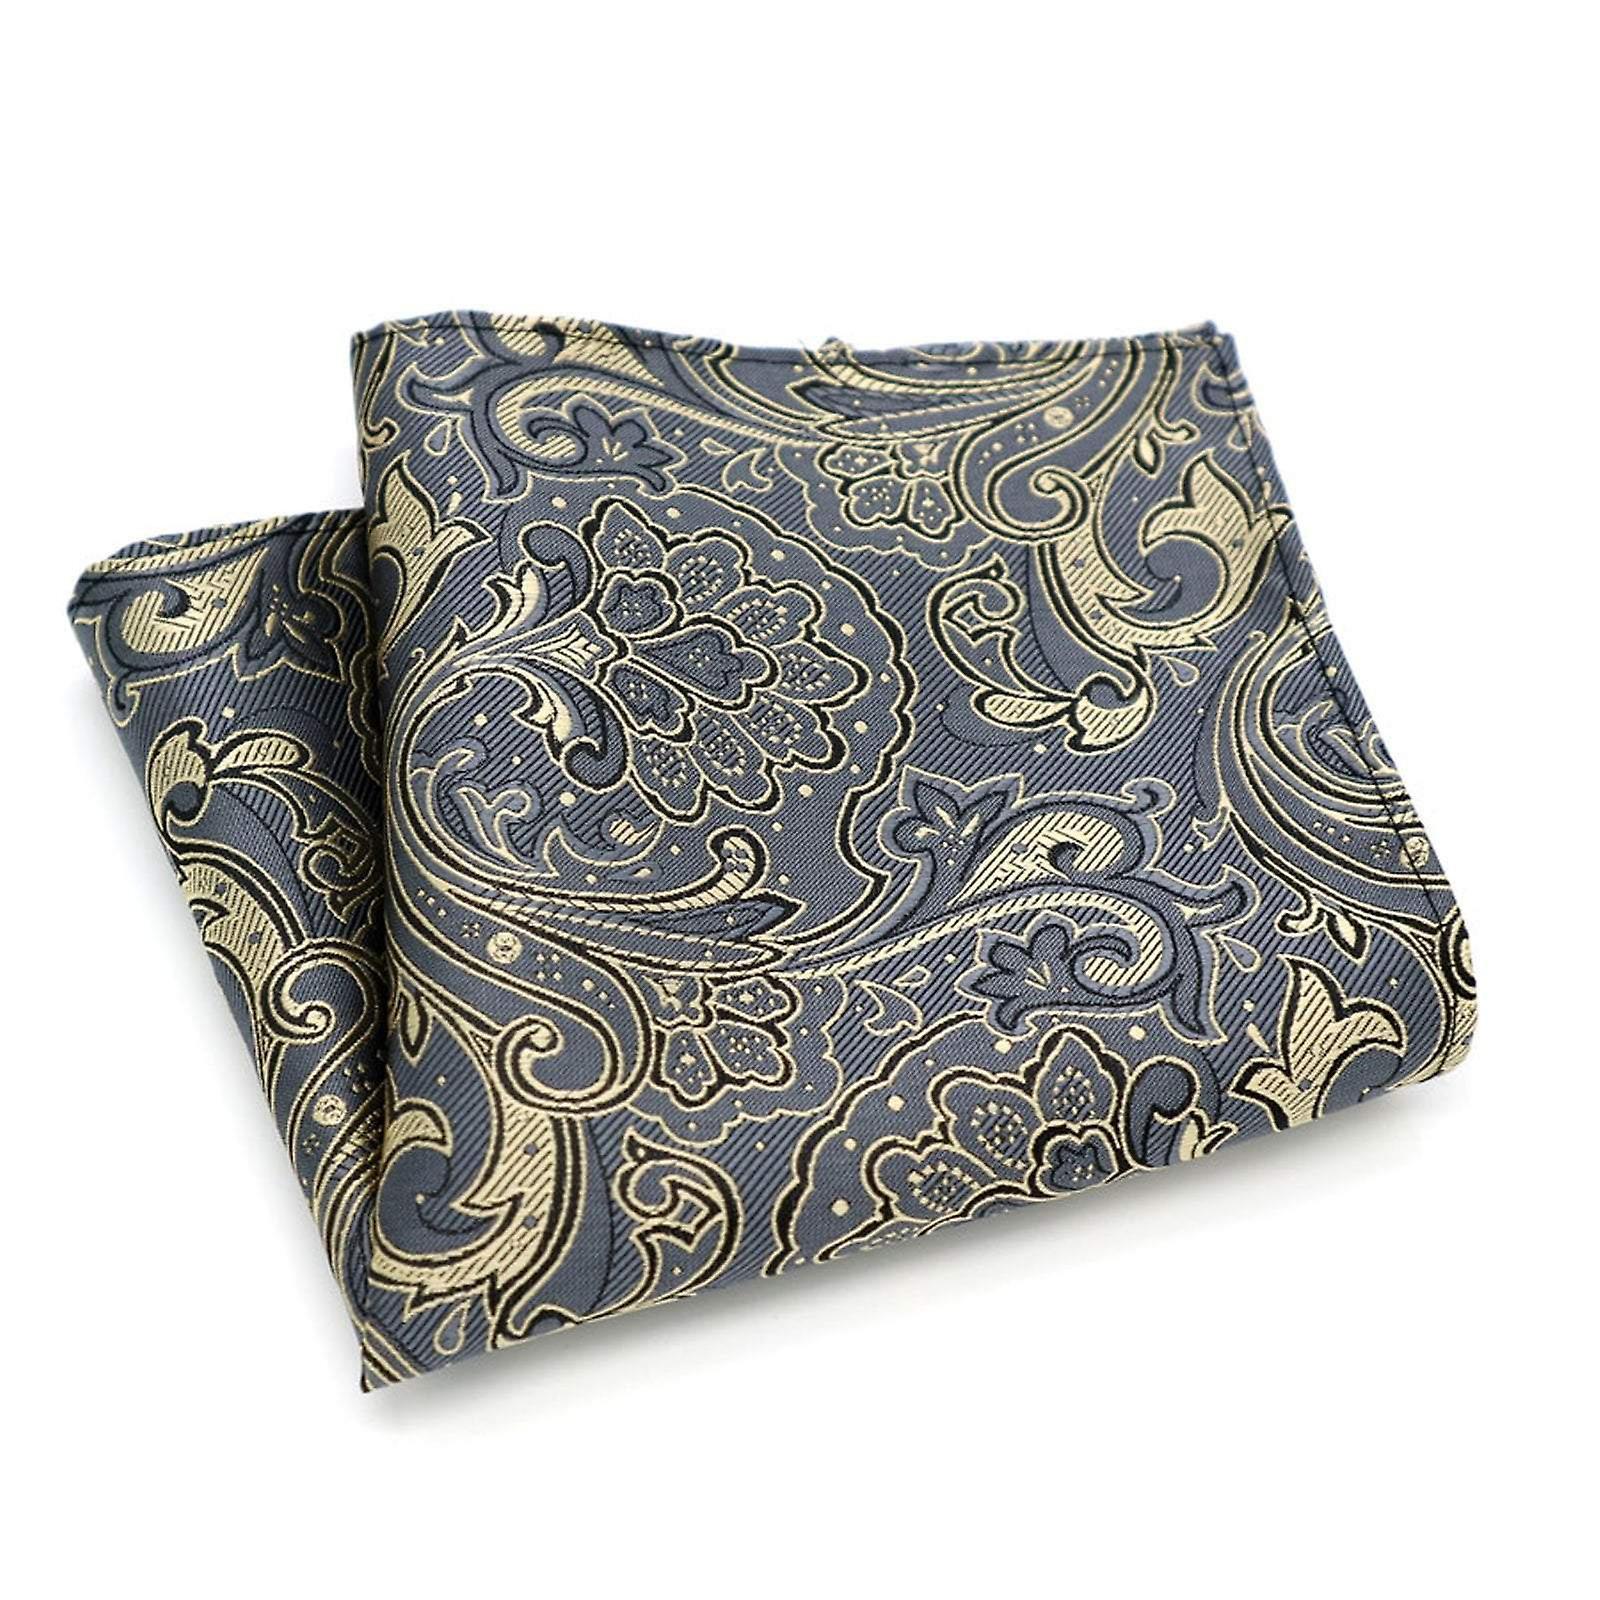 Gun metal grey paisley pattern pocket square hanky